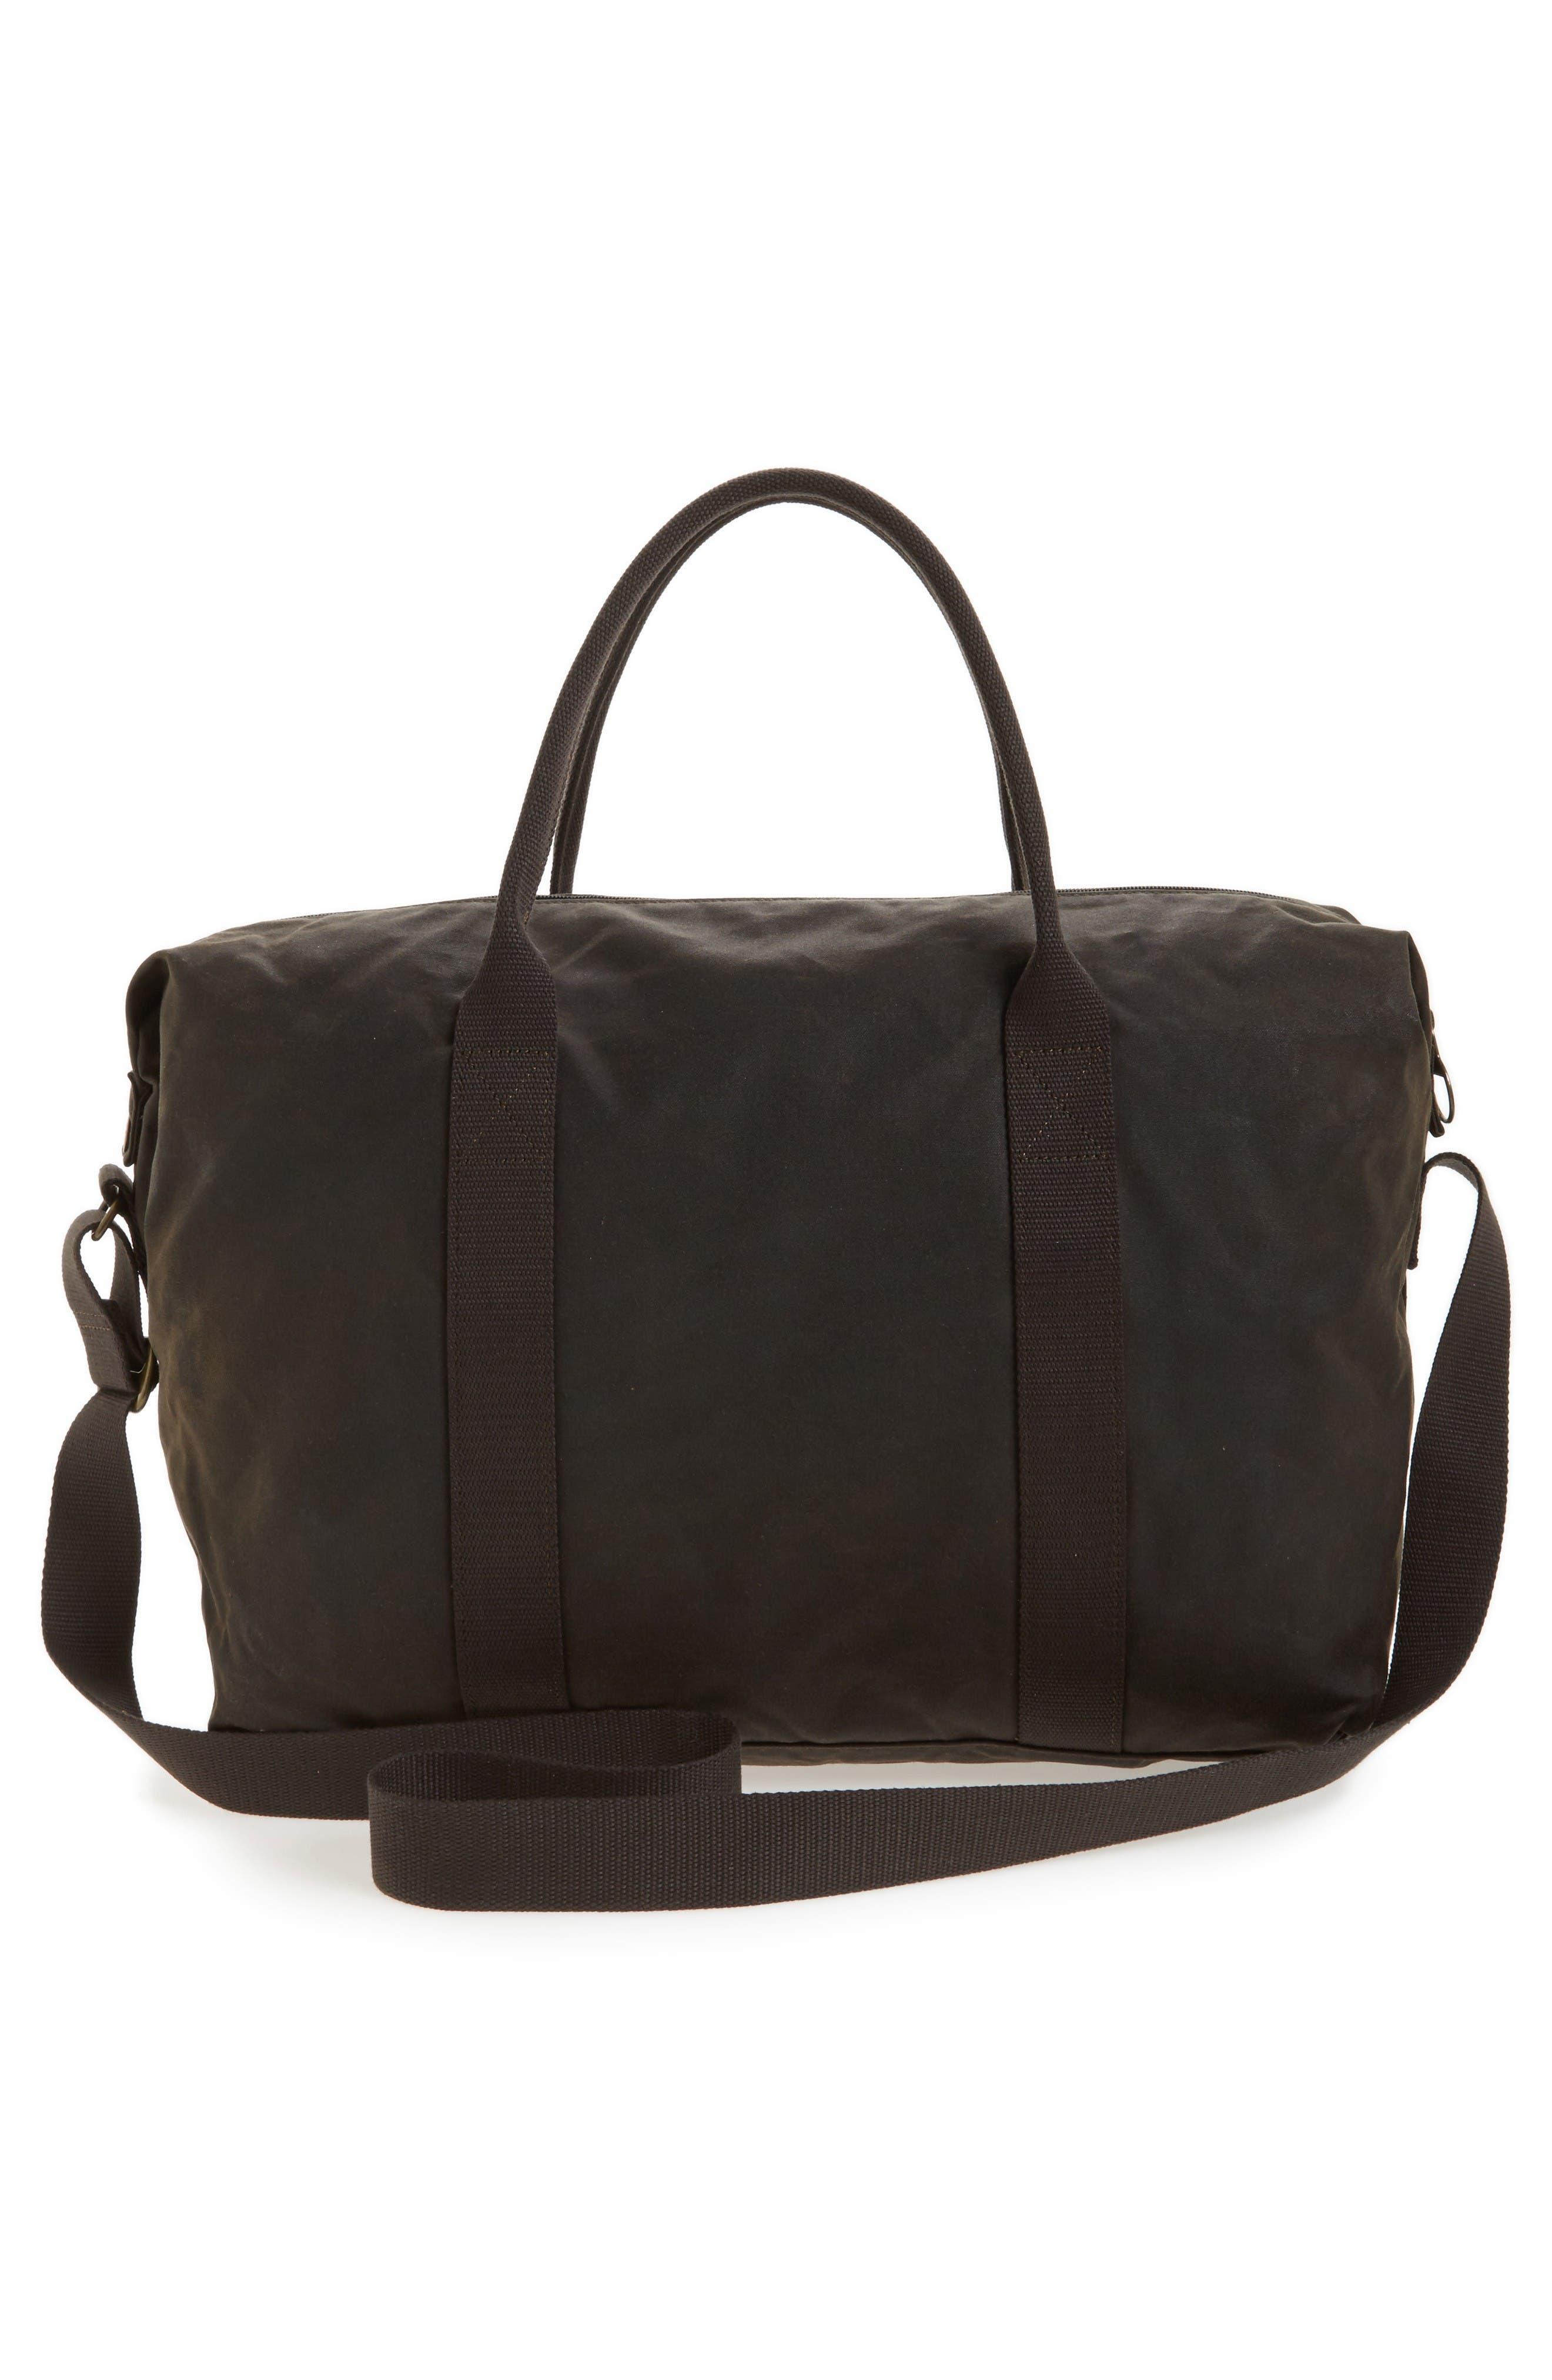 Dromond Canvas Holdall Bag,                             Alternate thumbnail 3, color,                             Olive